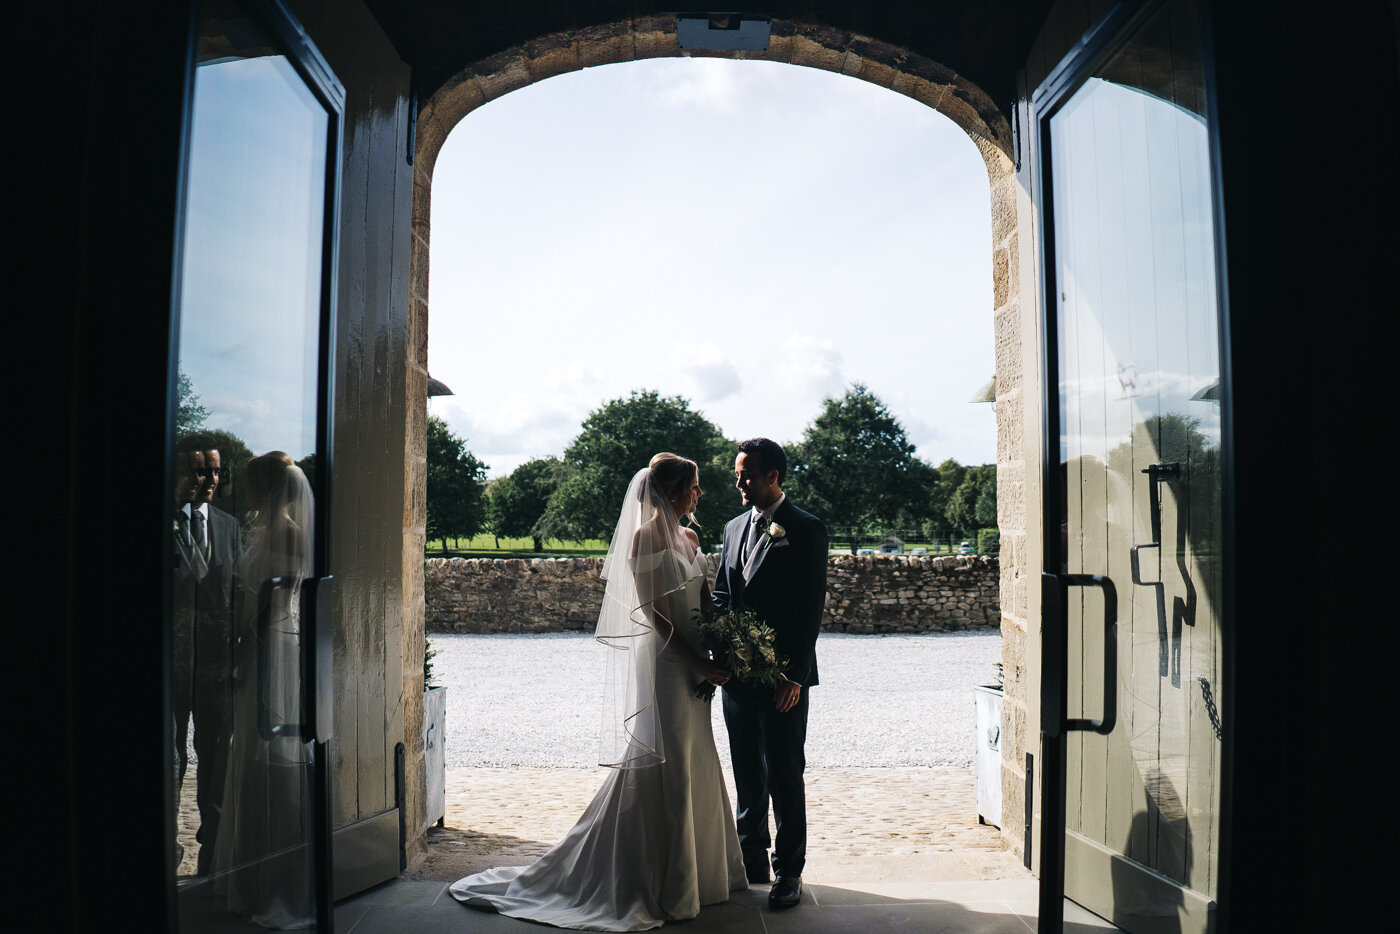 tithe-barn-bolton-abbey-north-yorkshire-cripps-wedding-photographer-creative-0029.jpg